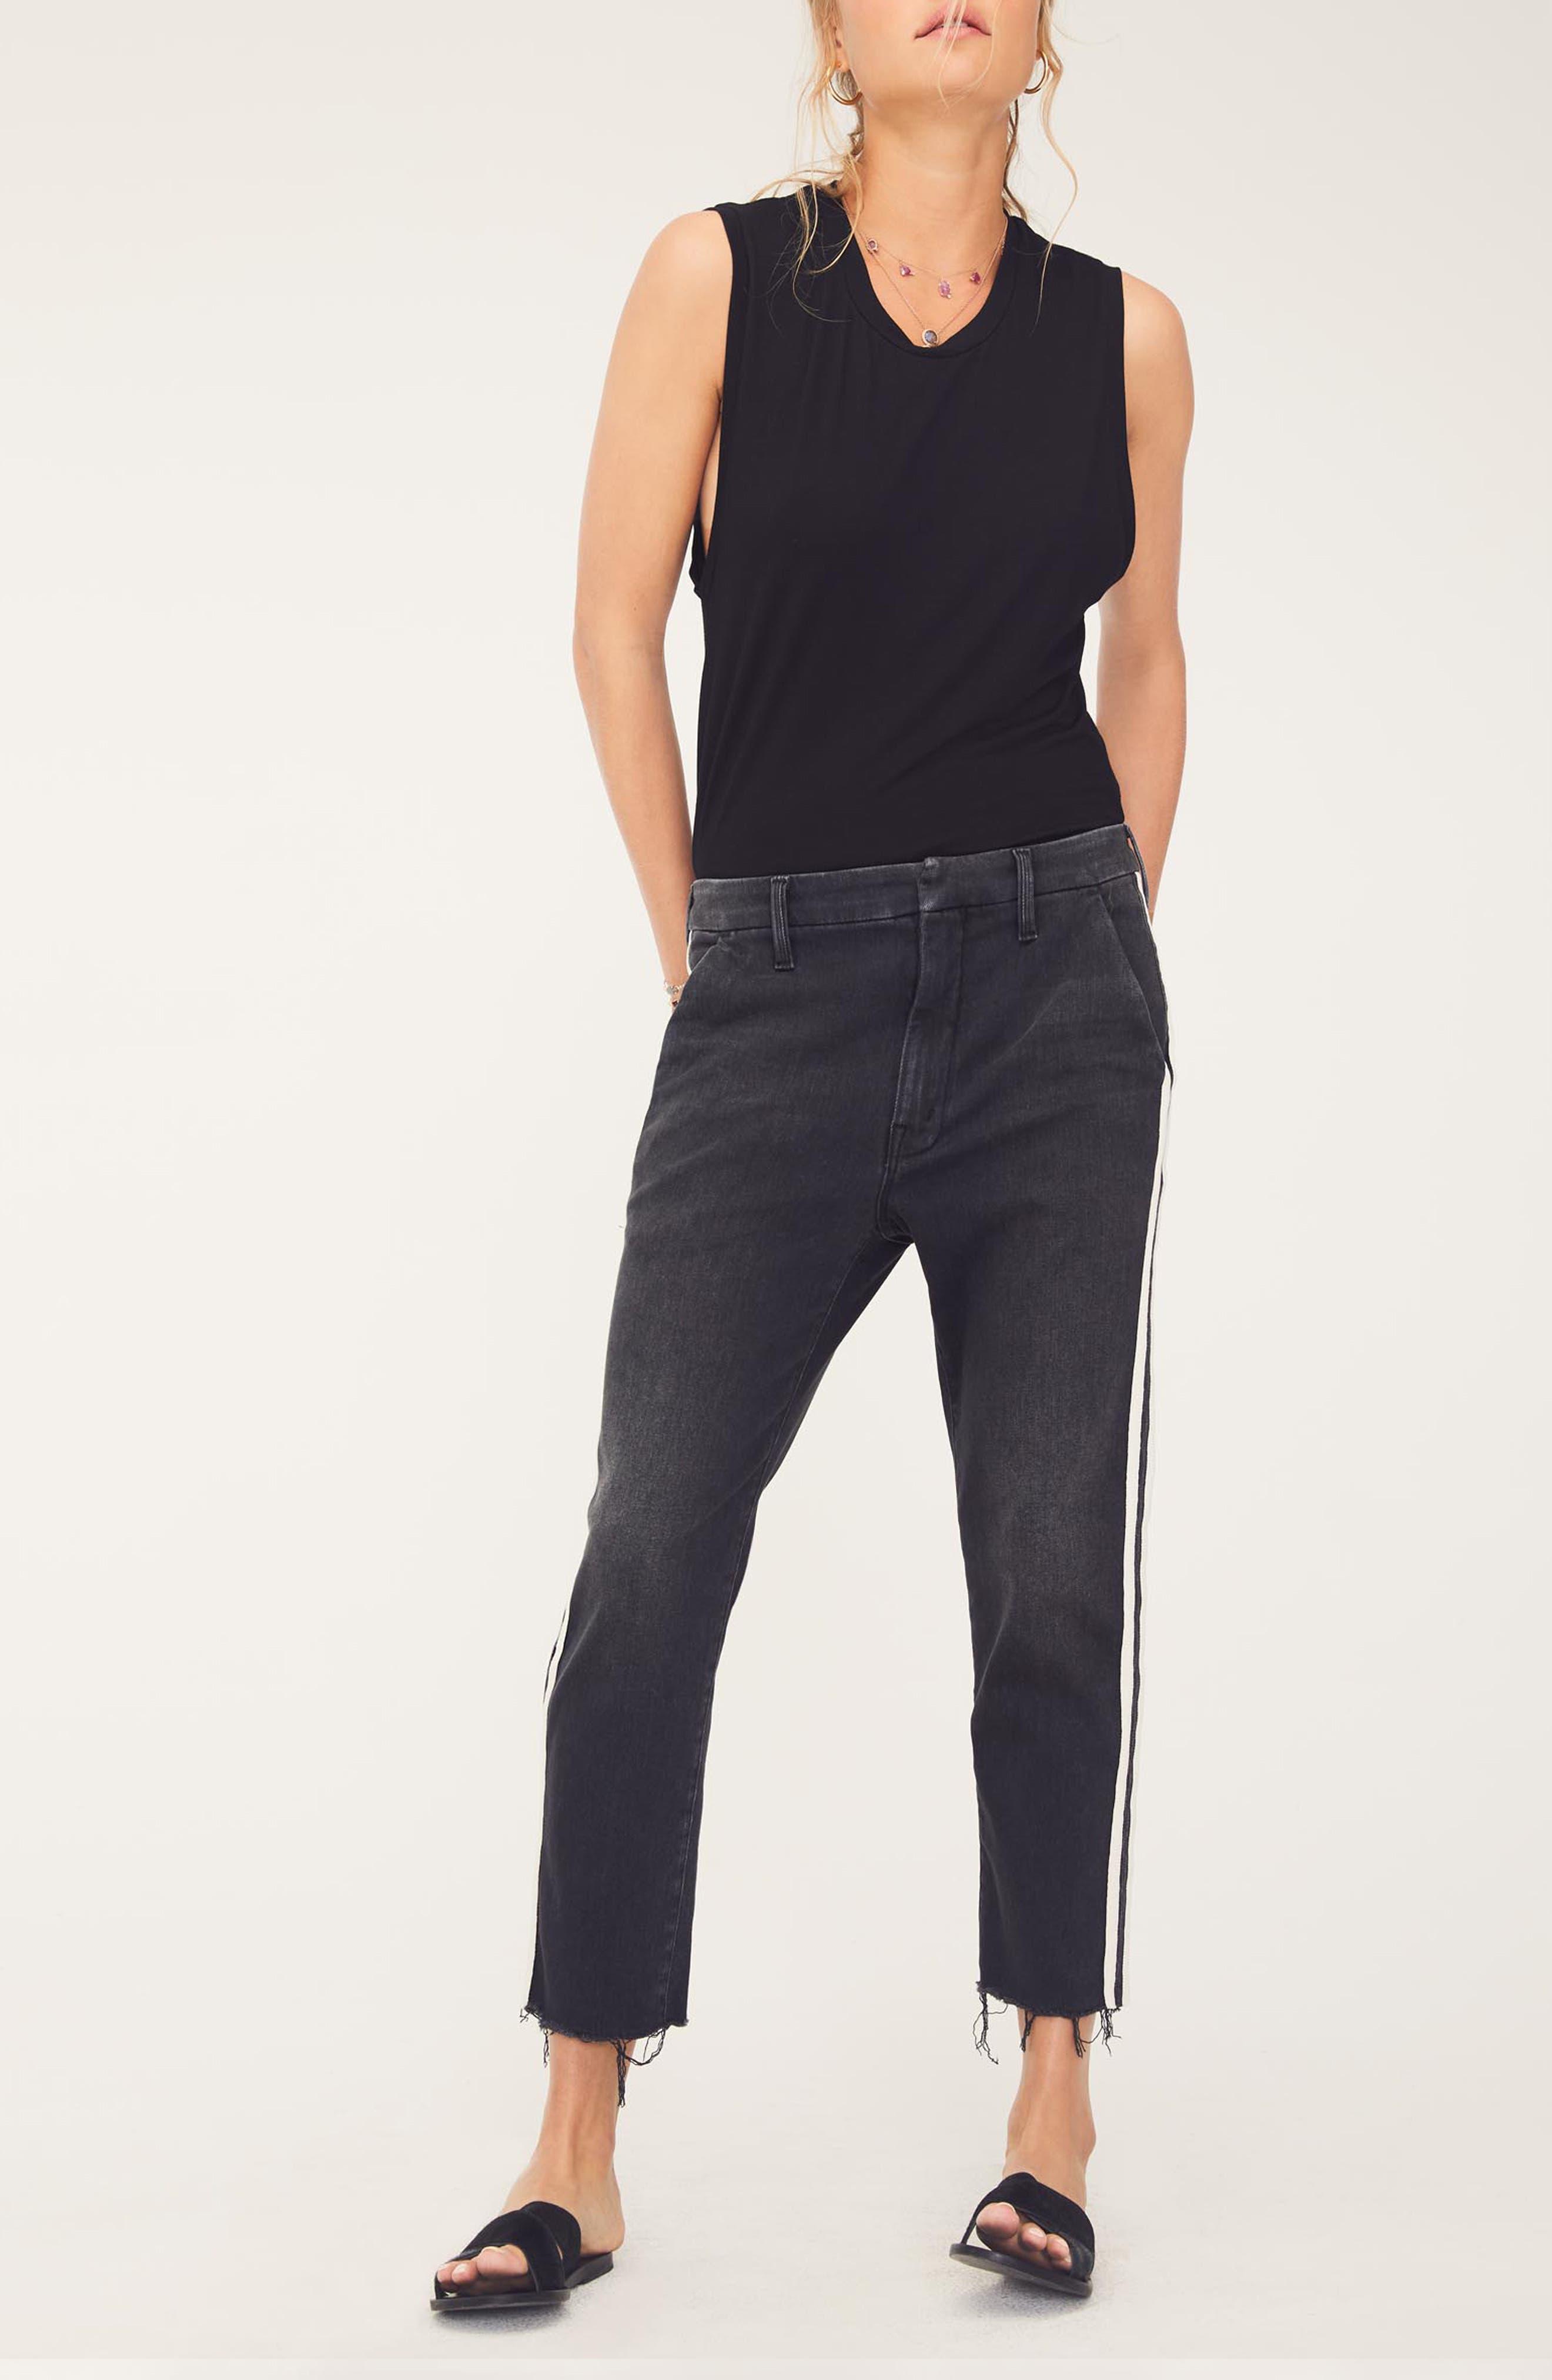 MOTHER, The Shaker Prep High Waist Crop Slim Jeans, Alternate thumbnail 7, color, DEAR MR. BLACK RACER